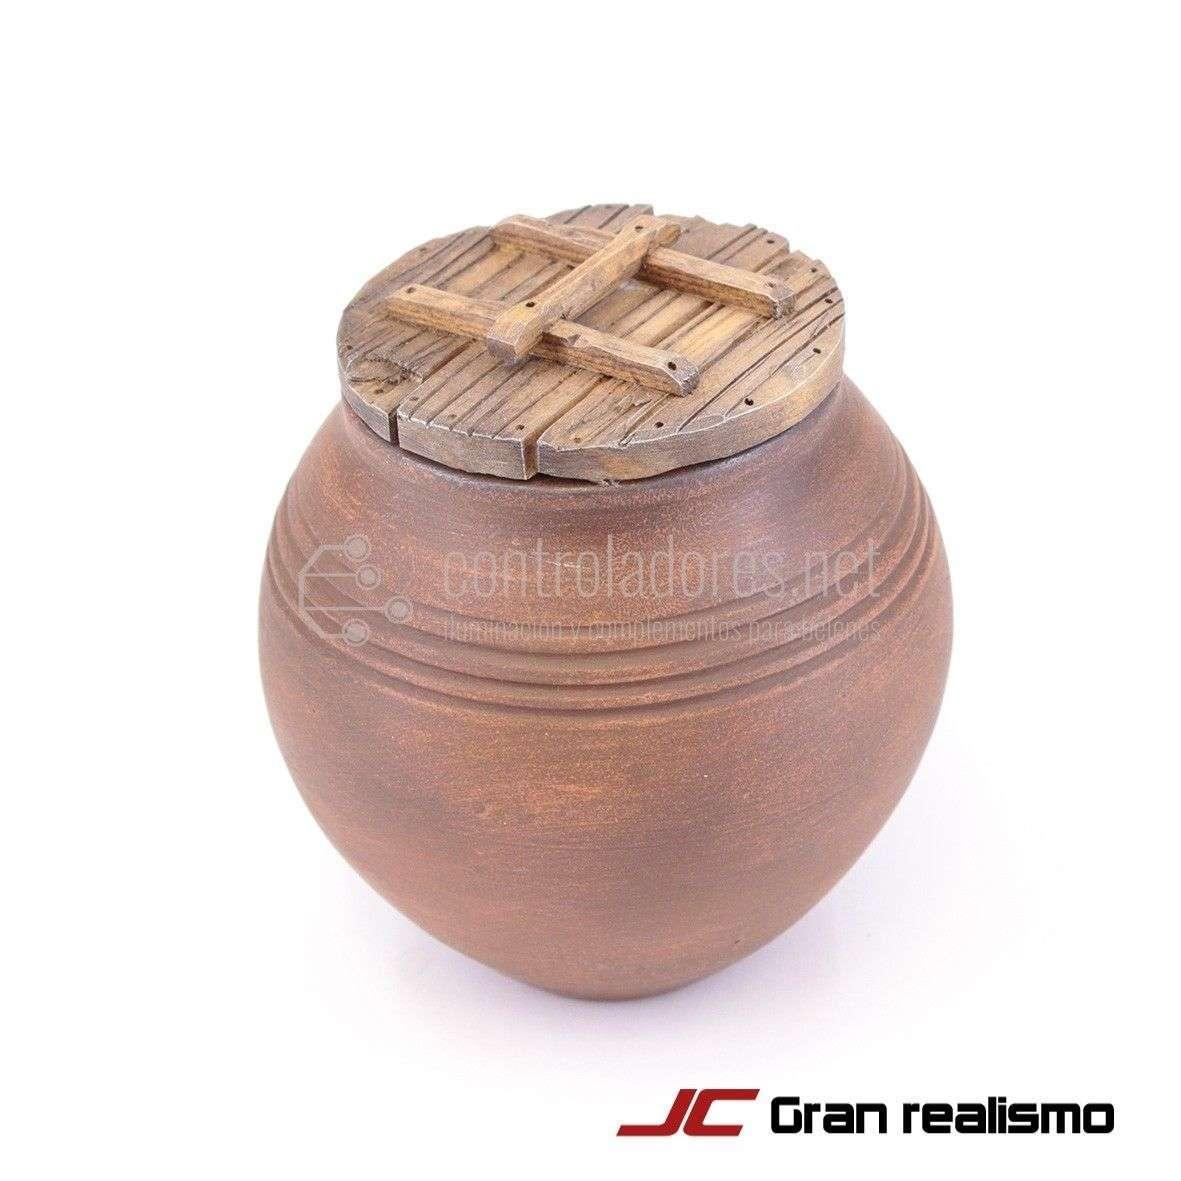 Cerámica con tapa de madera